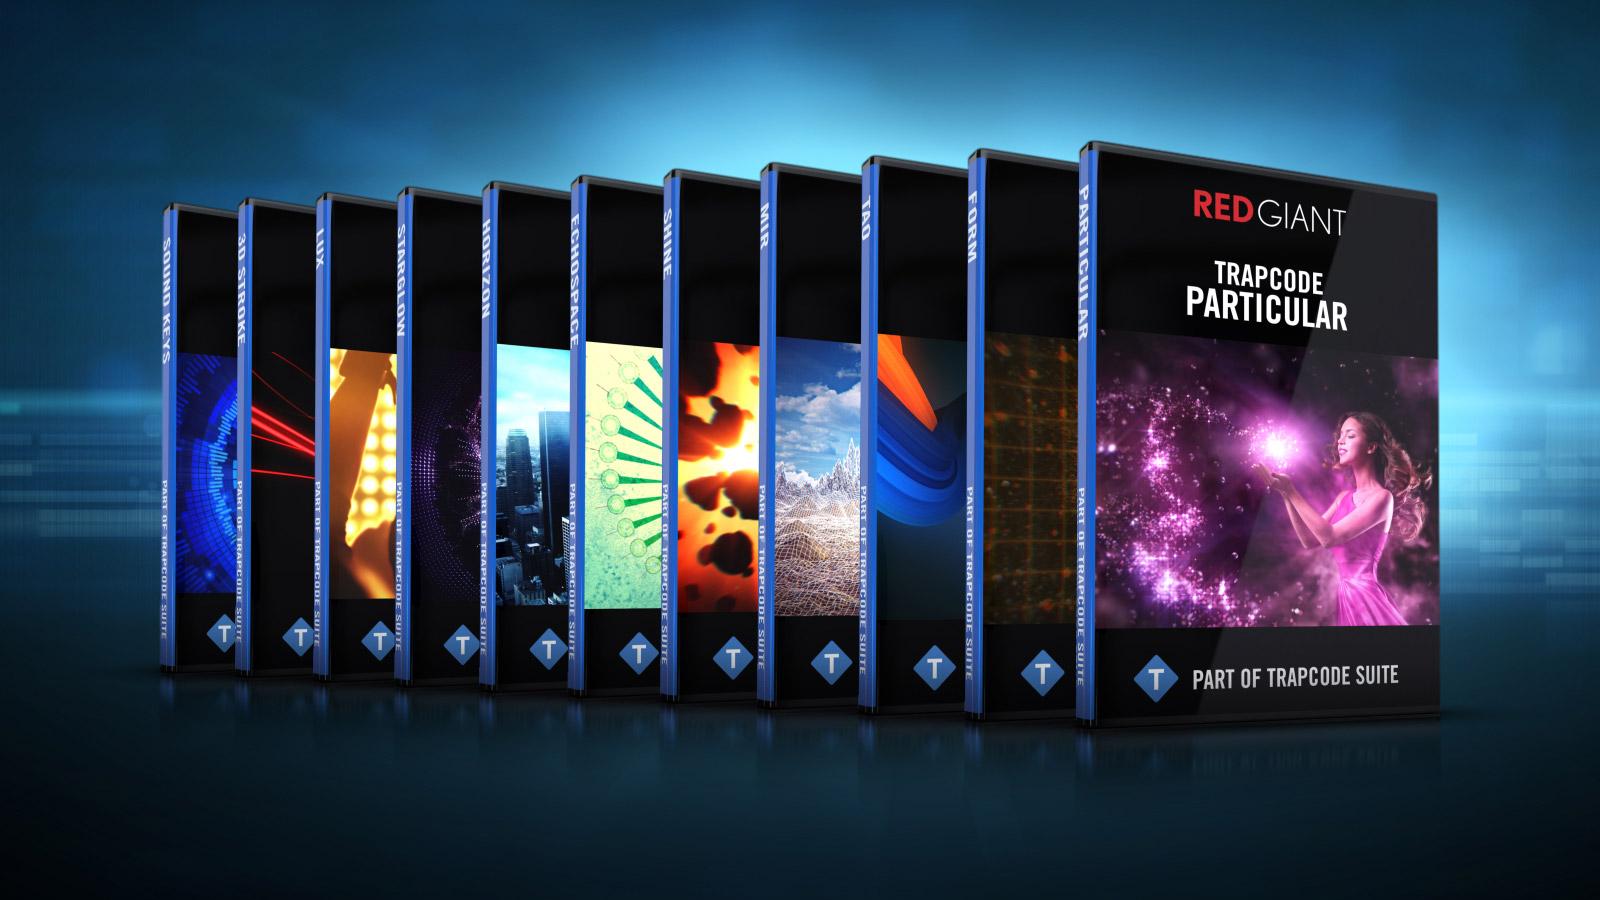 Red Giant Trapcode Suite 13.1.1 Win/Mac注册版-红巨星特效插件套装